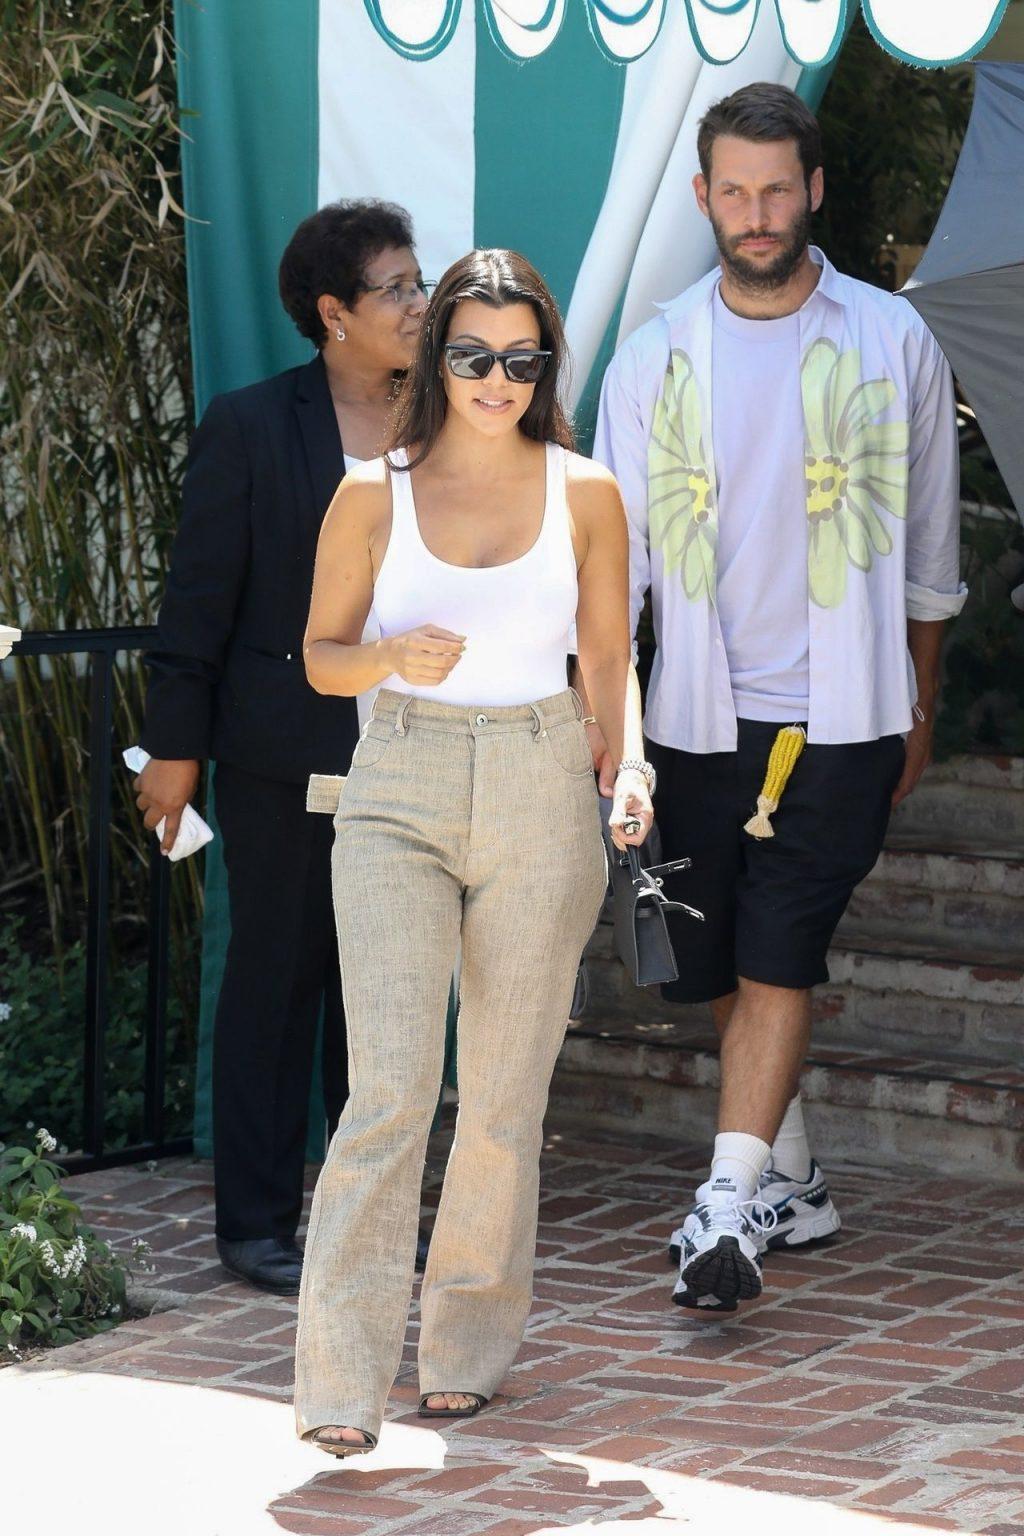 Kourtney Kardashian See Through Thefappeningblog Com 45 1024